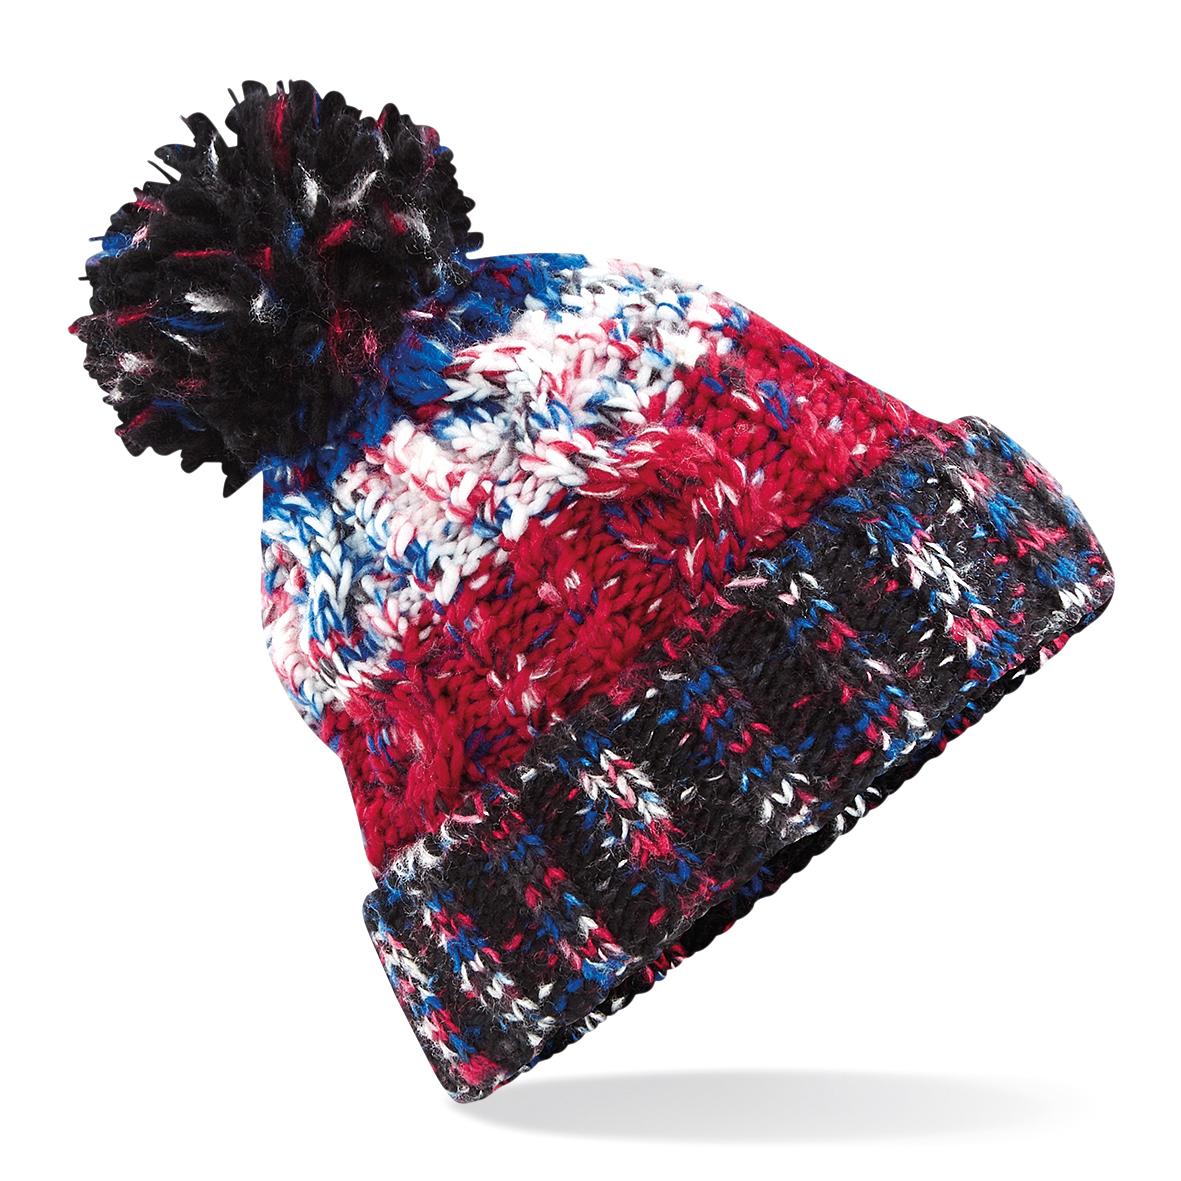 f4334762d9 Knitted Corkscrew Beanie Bobble Hat